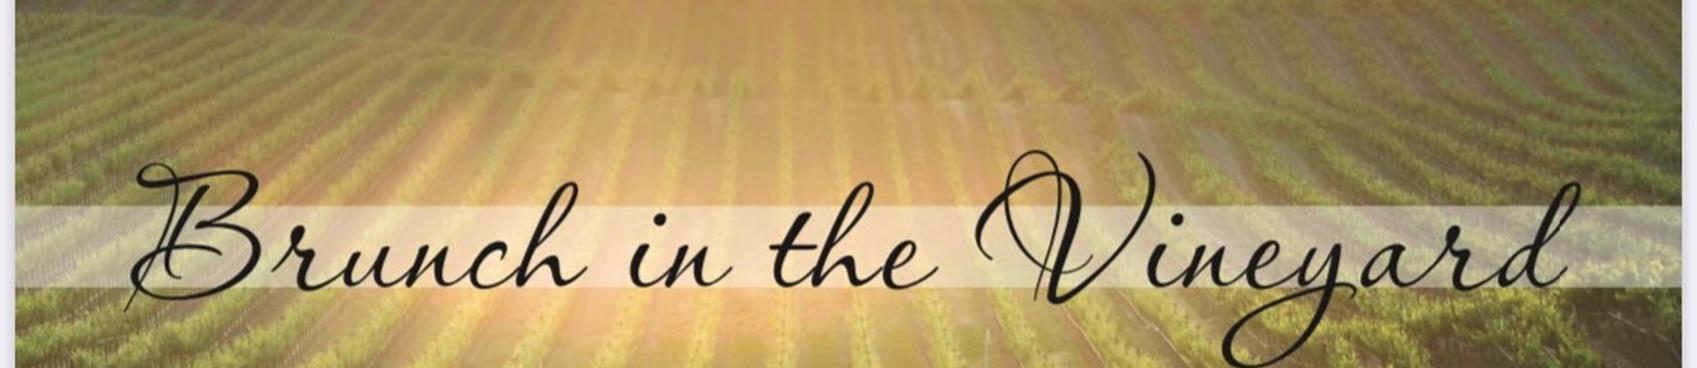 Brunch in the Vineyard